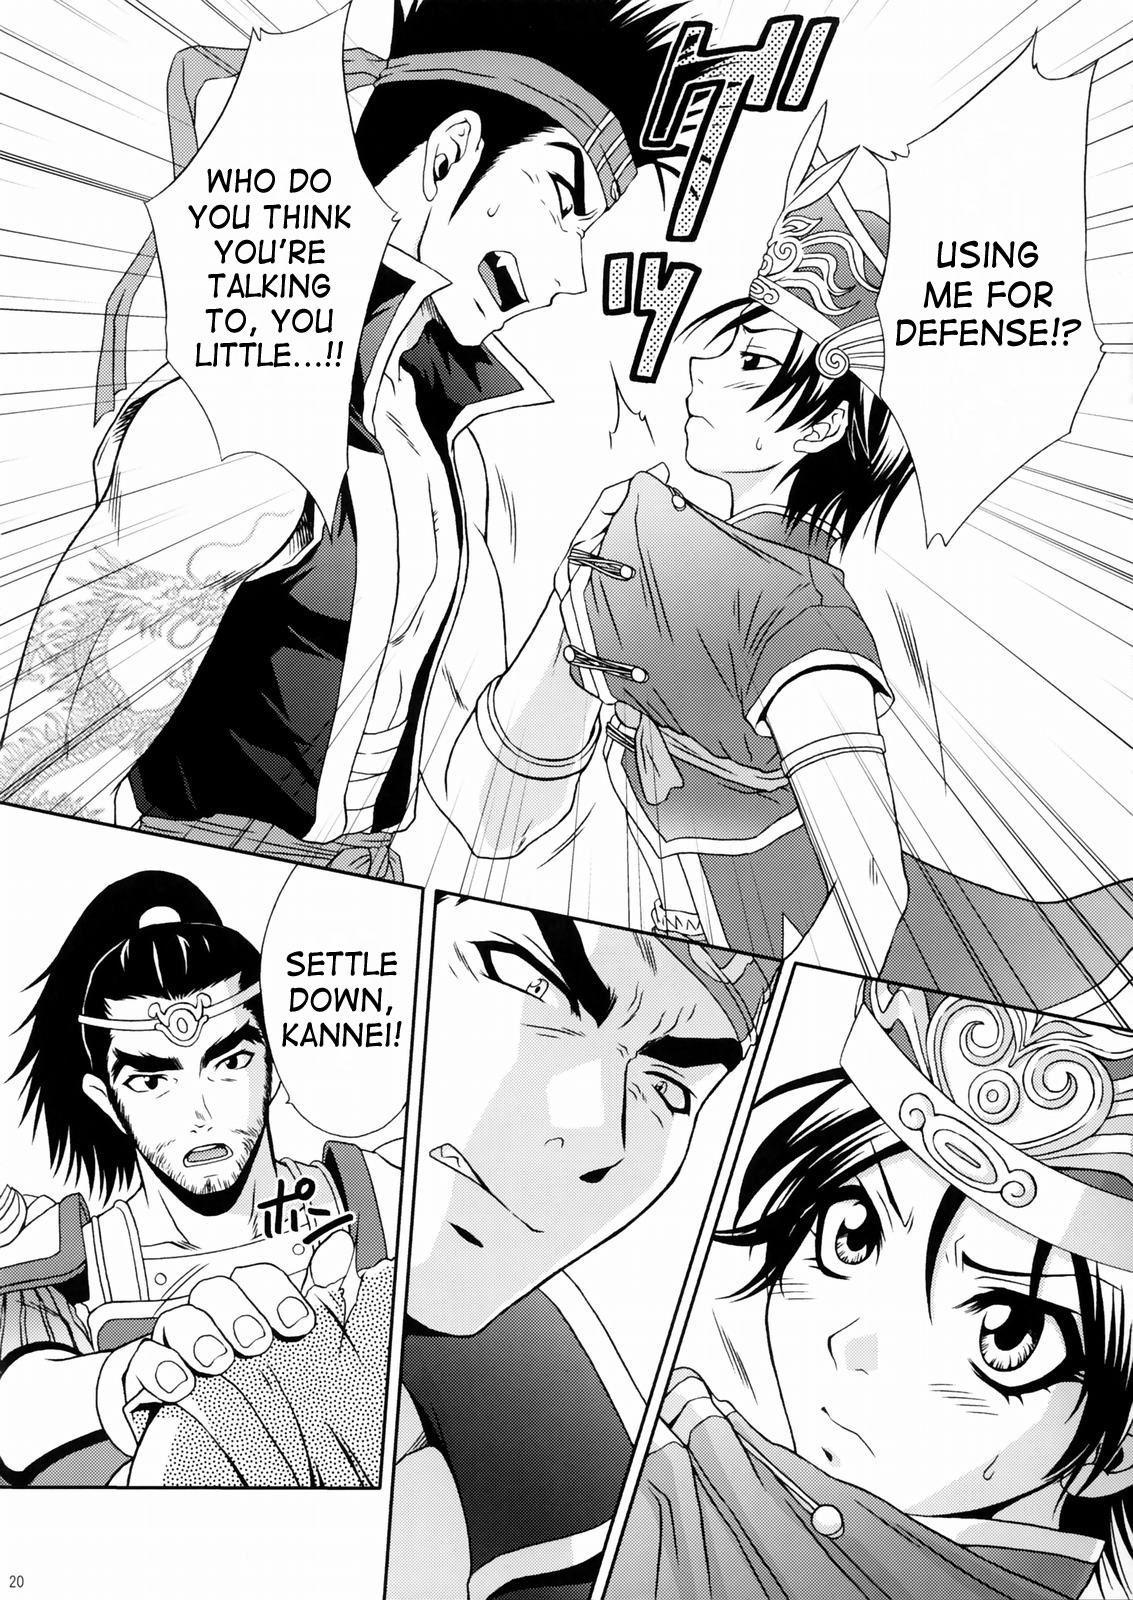 (C66) [U.R.C (Momoya Show-Neko)] Rikuson-chan ~Lovely Gunshi no Himitsu~ | Rikuson-chan Secret of The Lovely Strategist (Dynasty Warriors) [English] [SaHa] 18